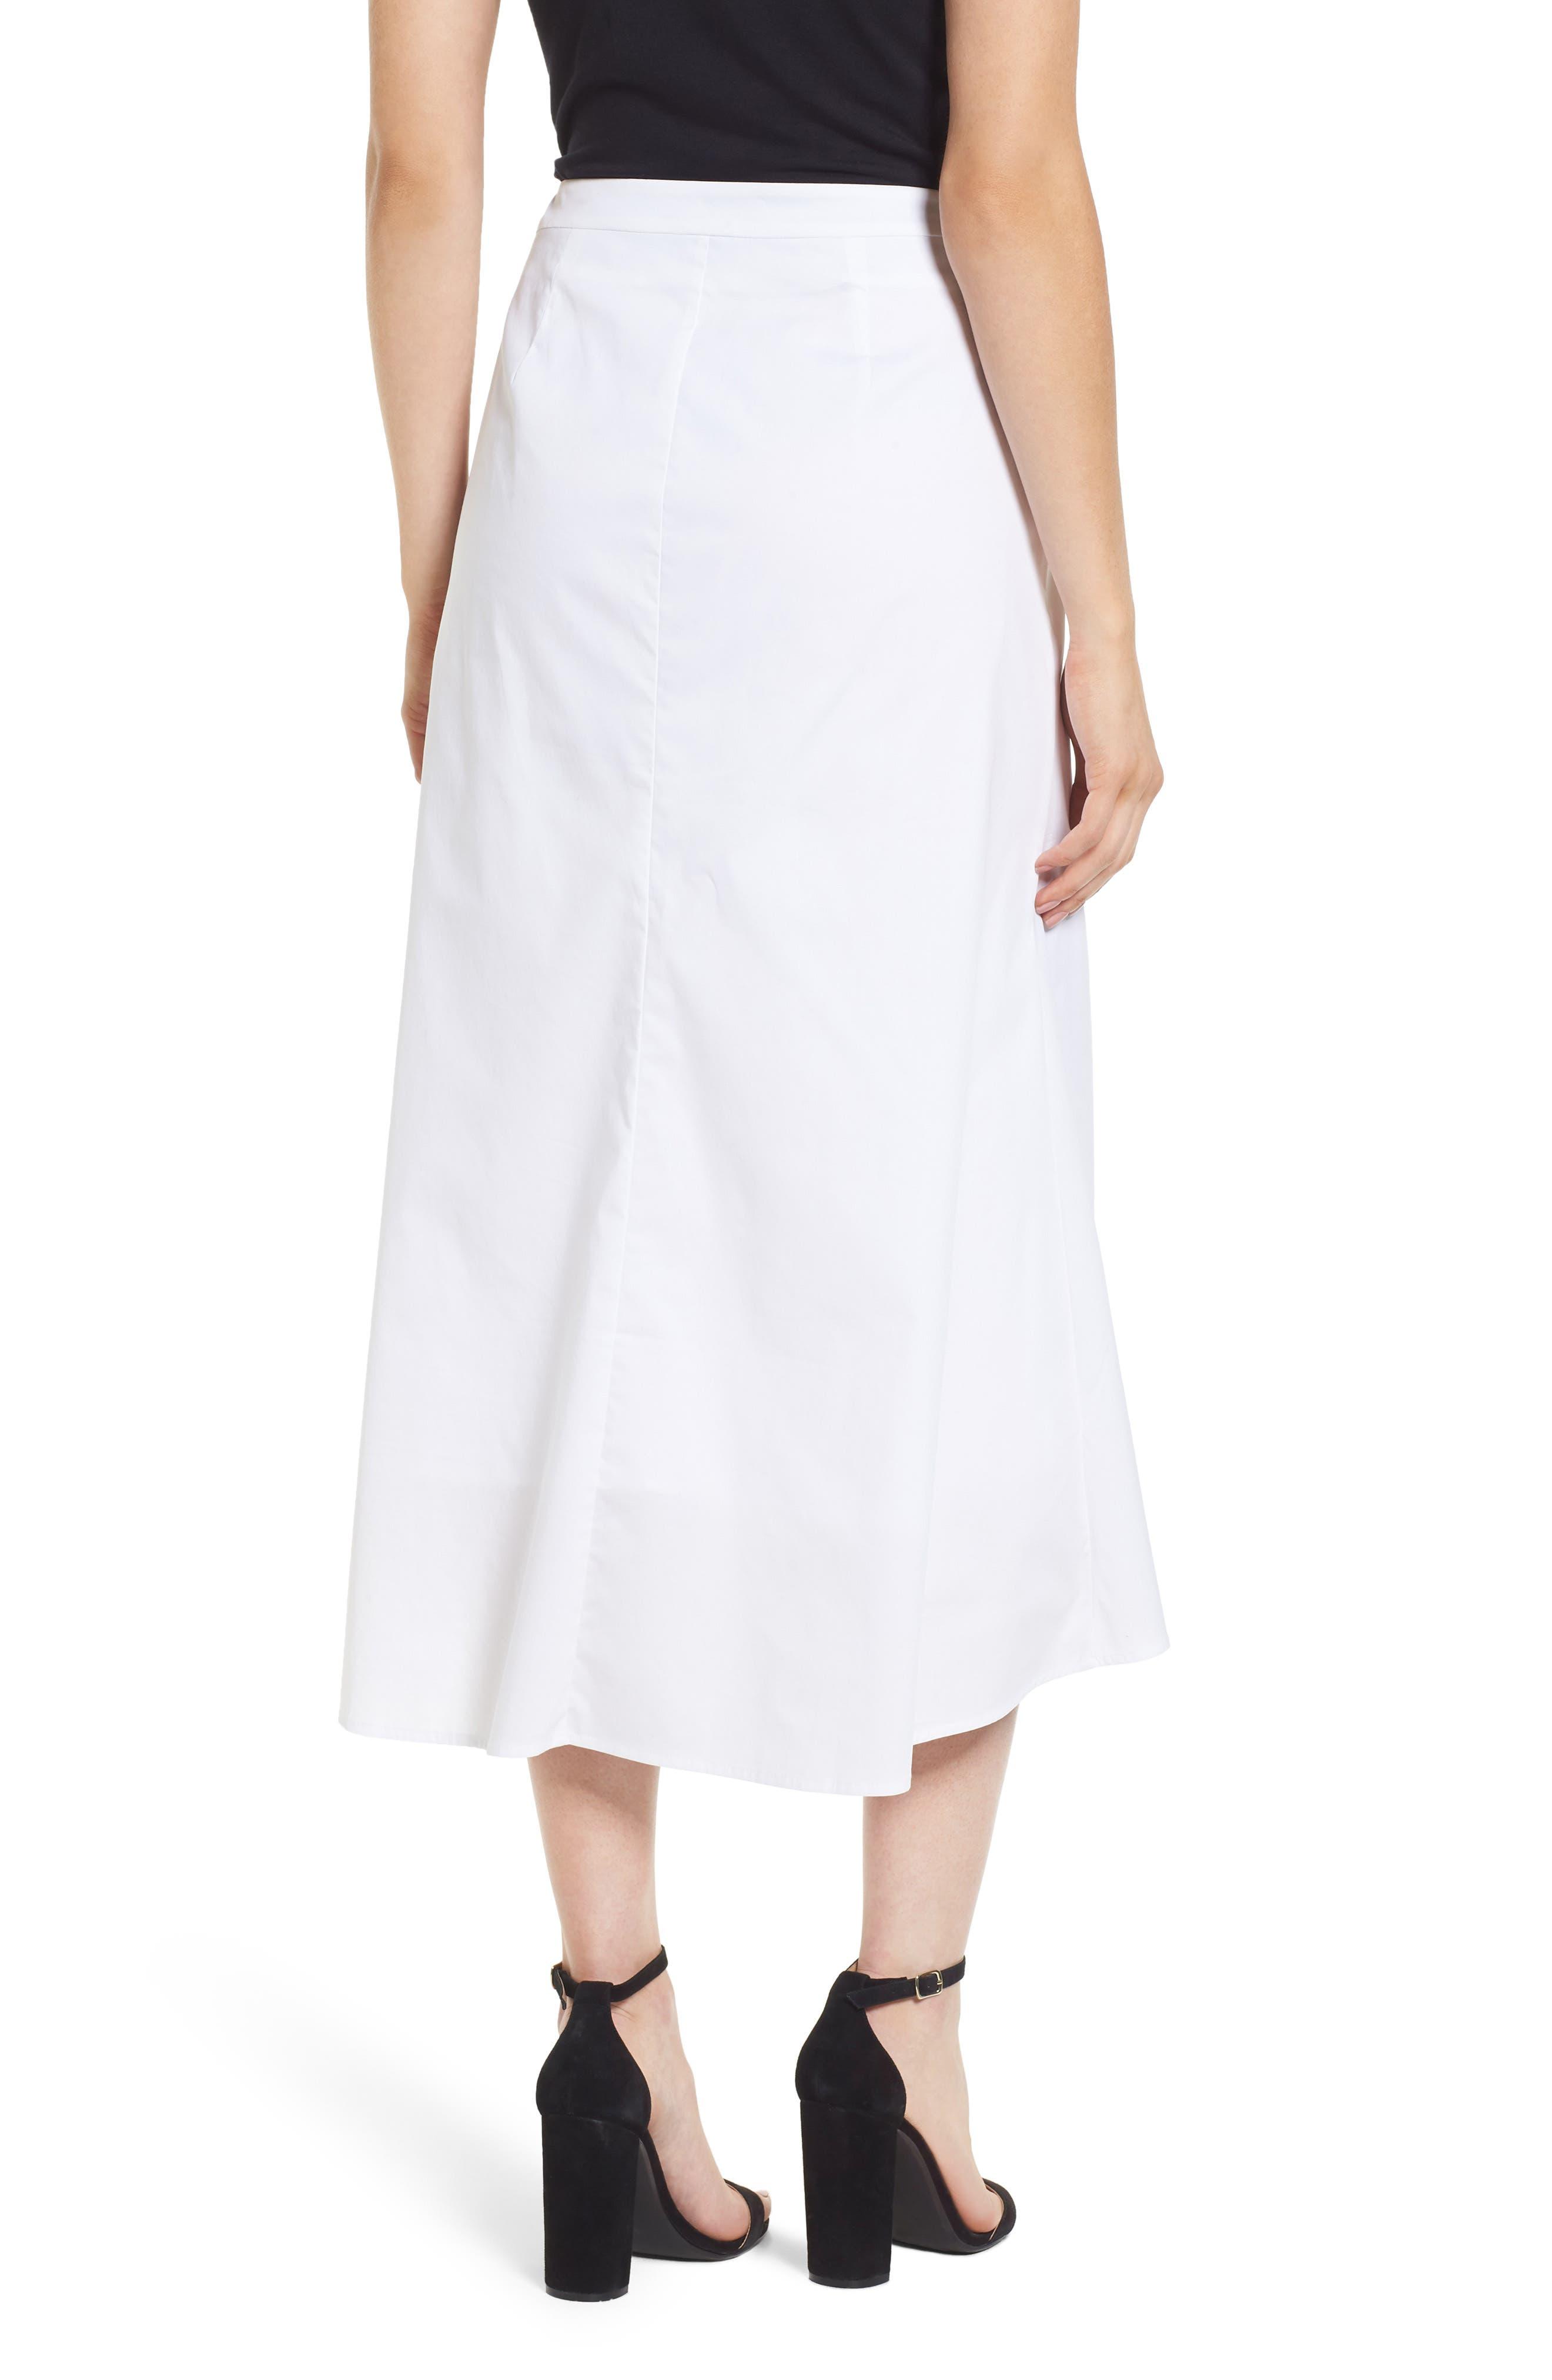 Ruched Front Midi Skirt,                             Alternate thumbnail 2, color,                             White